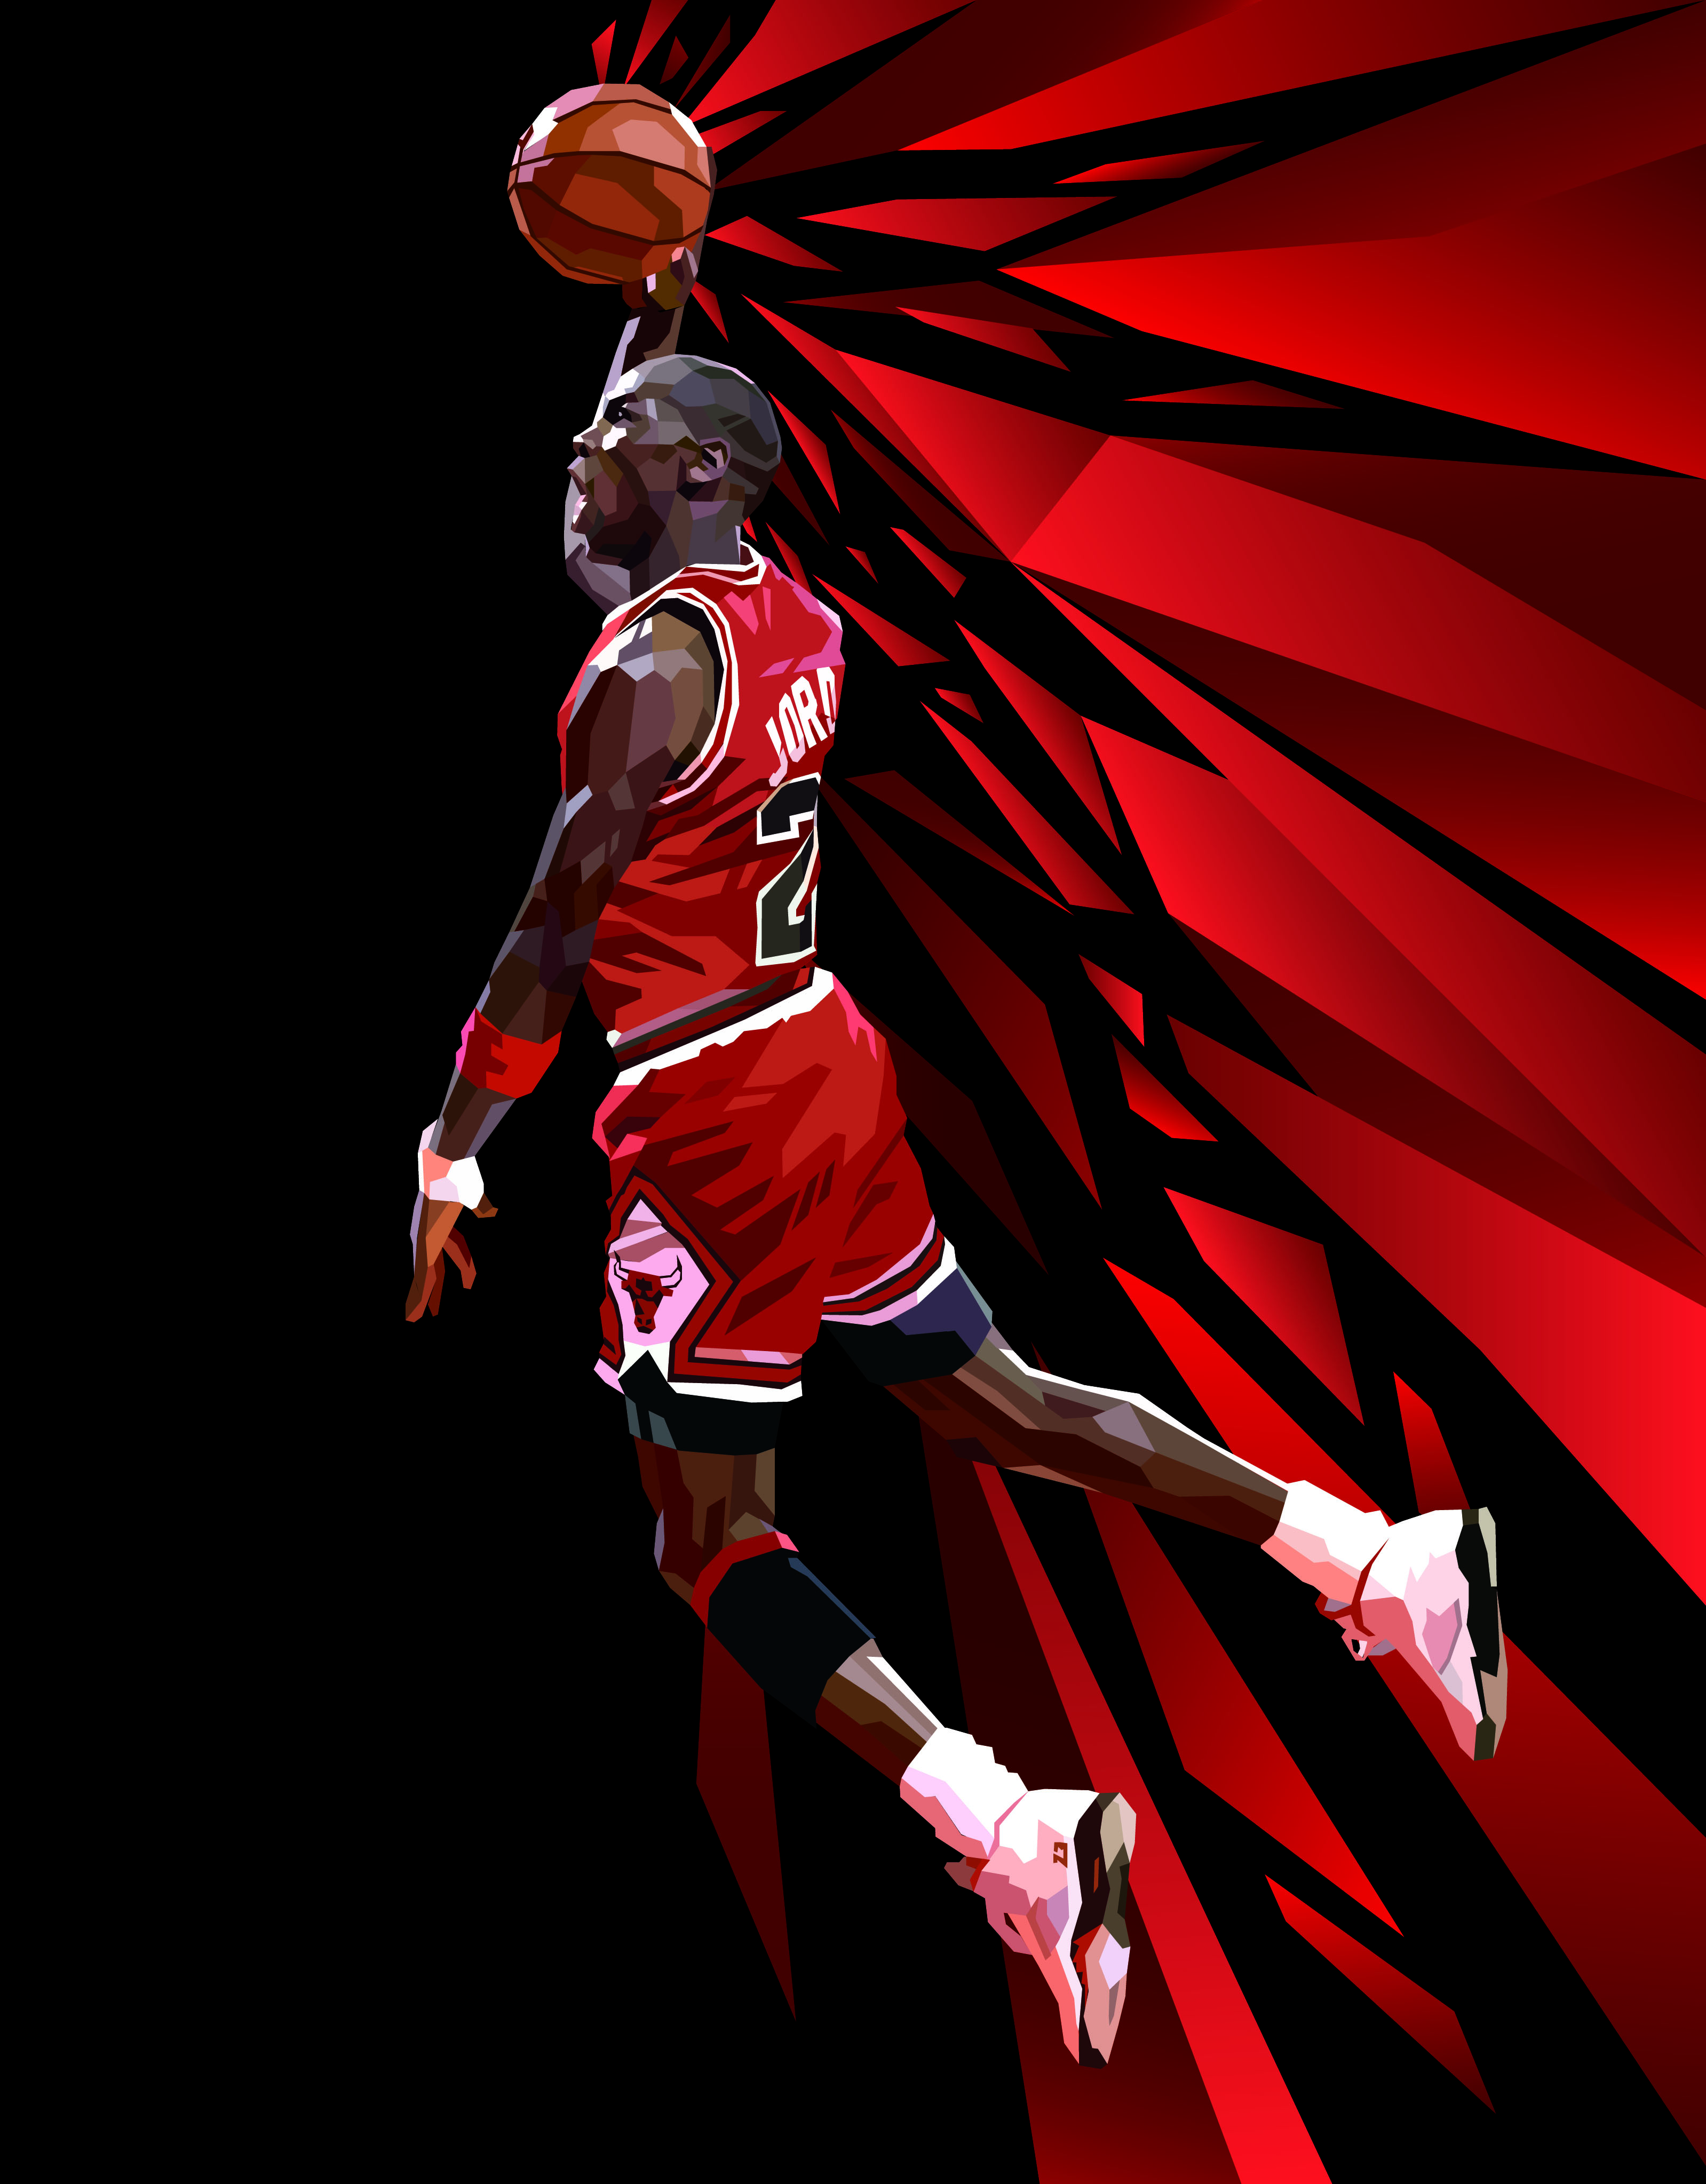 MJ_FINAL_1